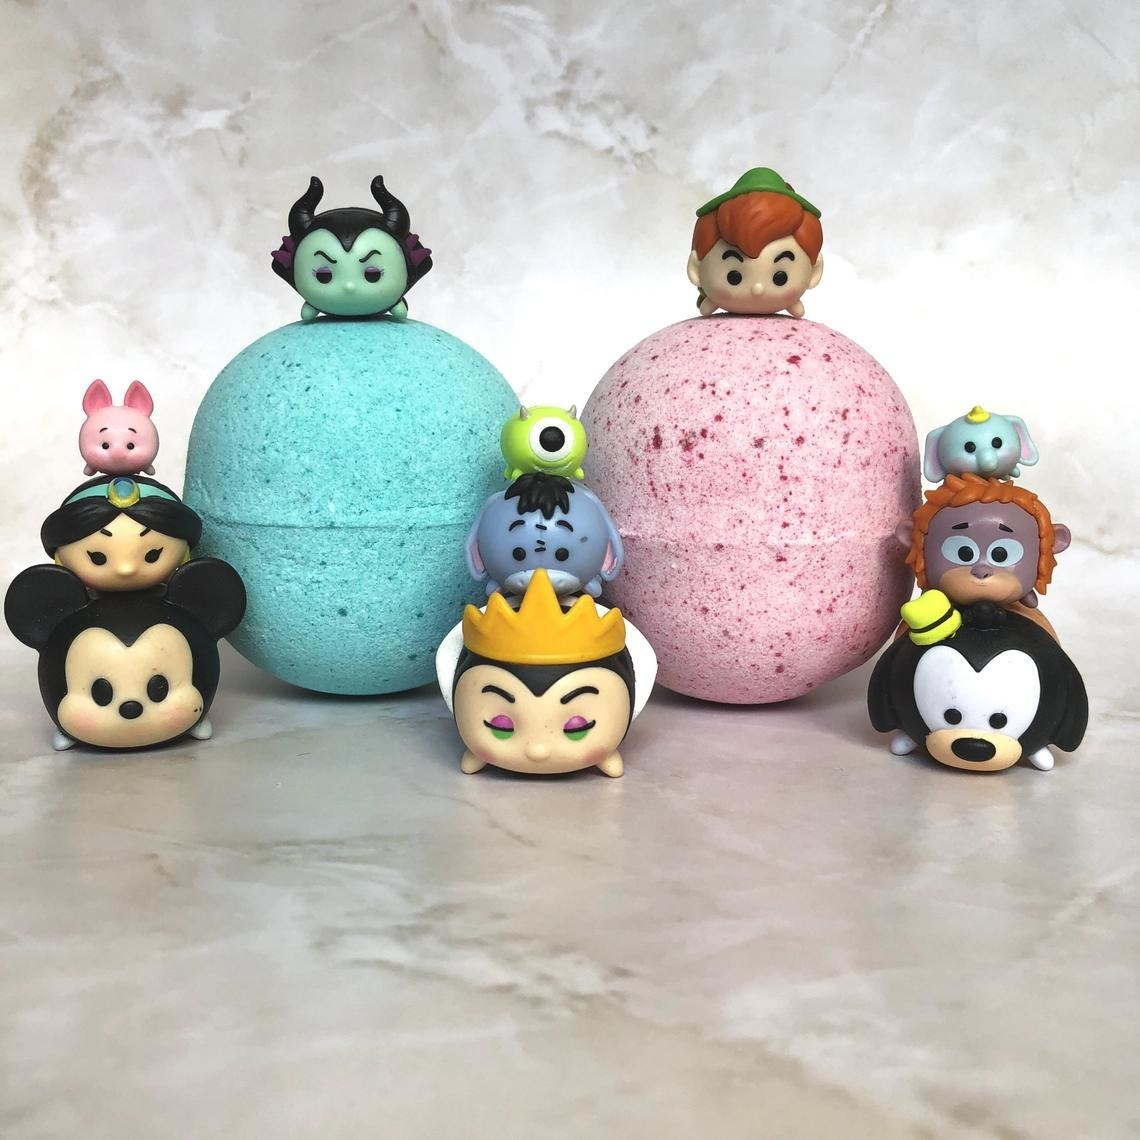 bath bomb with tsum tsum figures